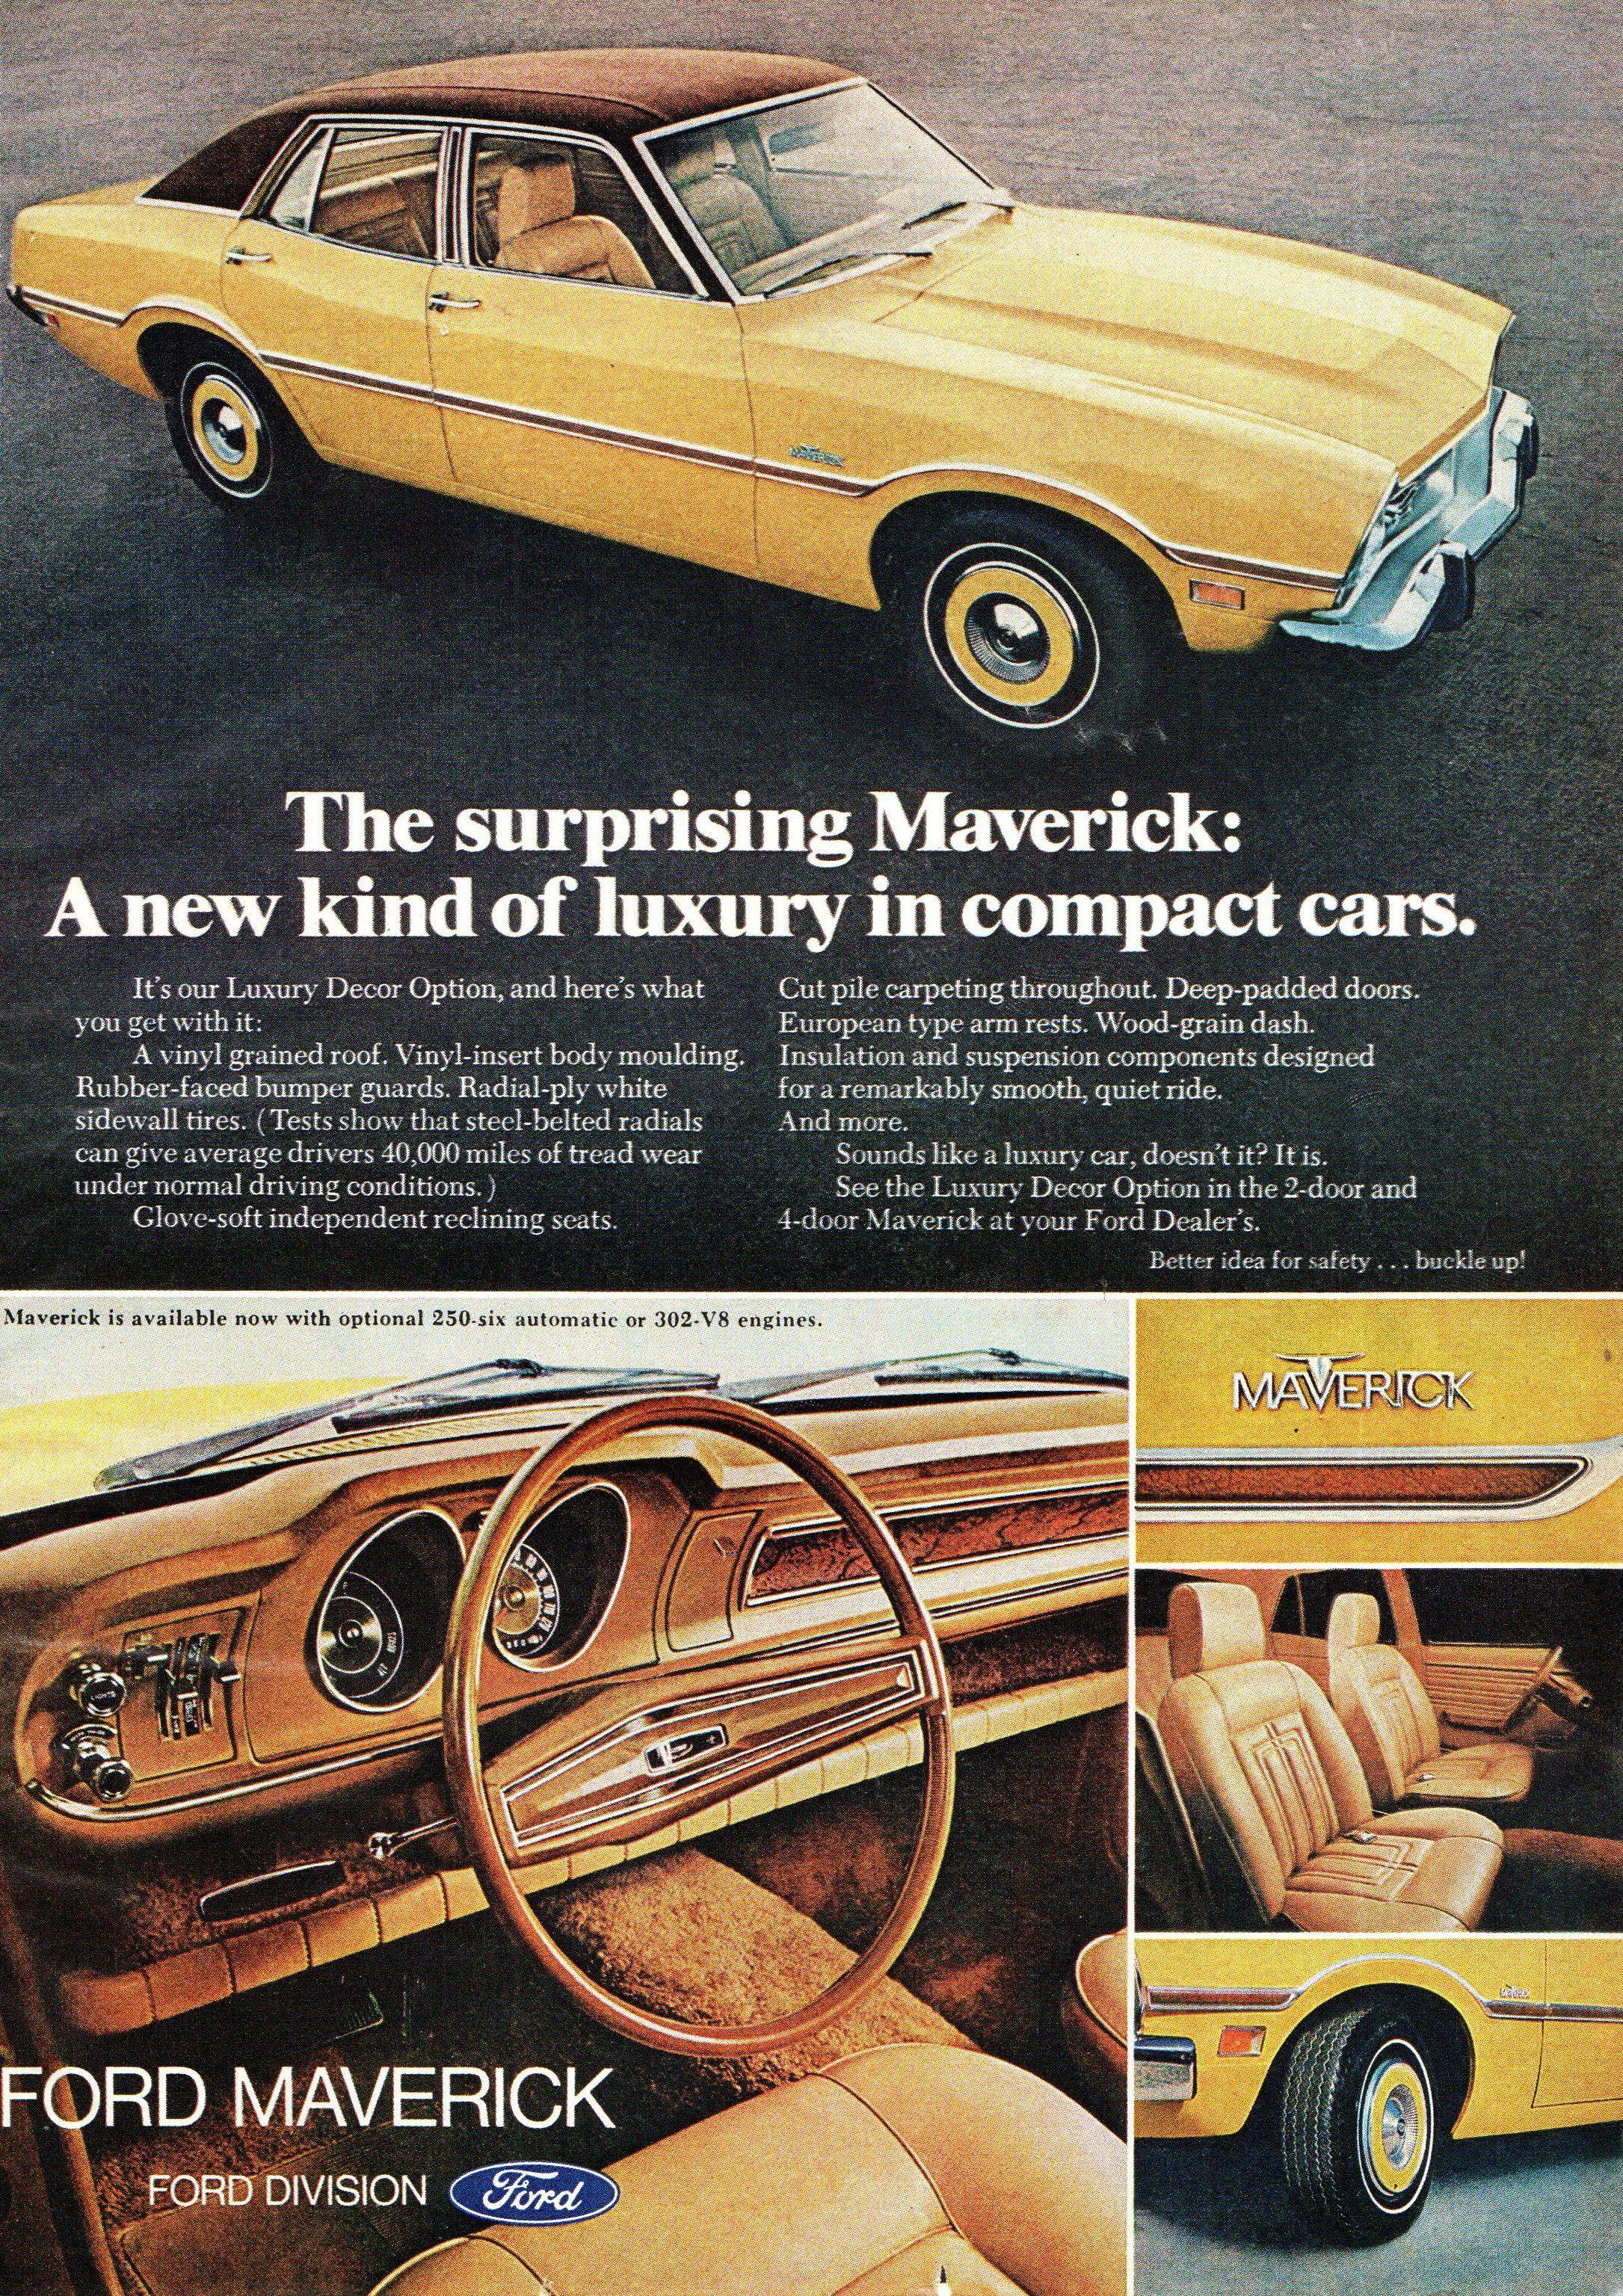 1973 Ford Maverick Sedan With Luxury Decor Option Usa Original Magazine Advertisement In 2020 Ford Maverick Car Ads Retro Cars